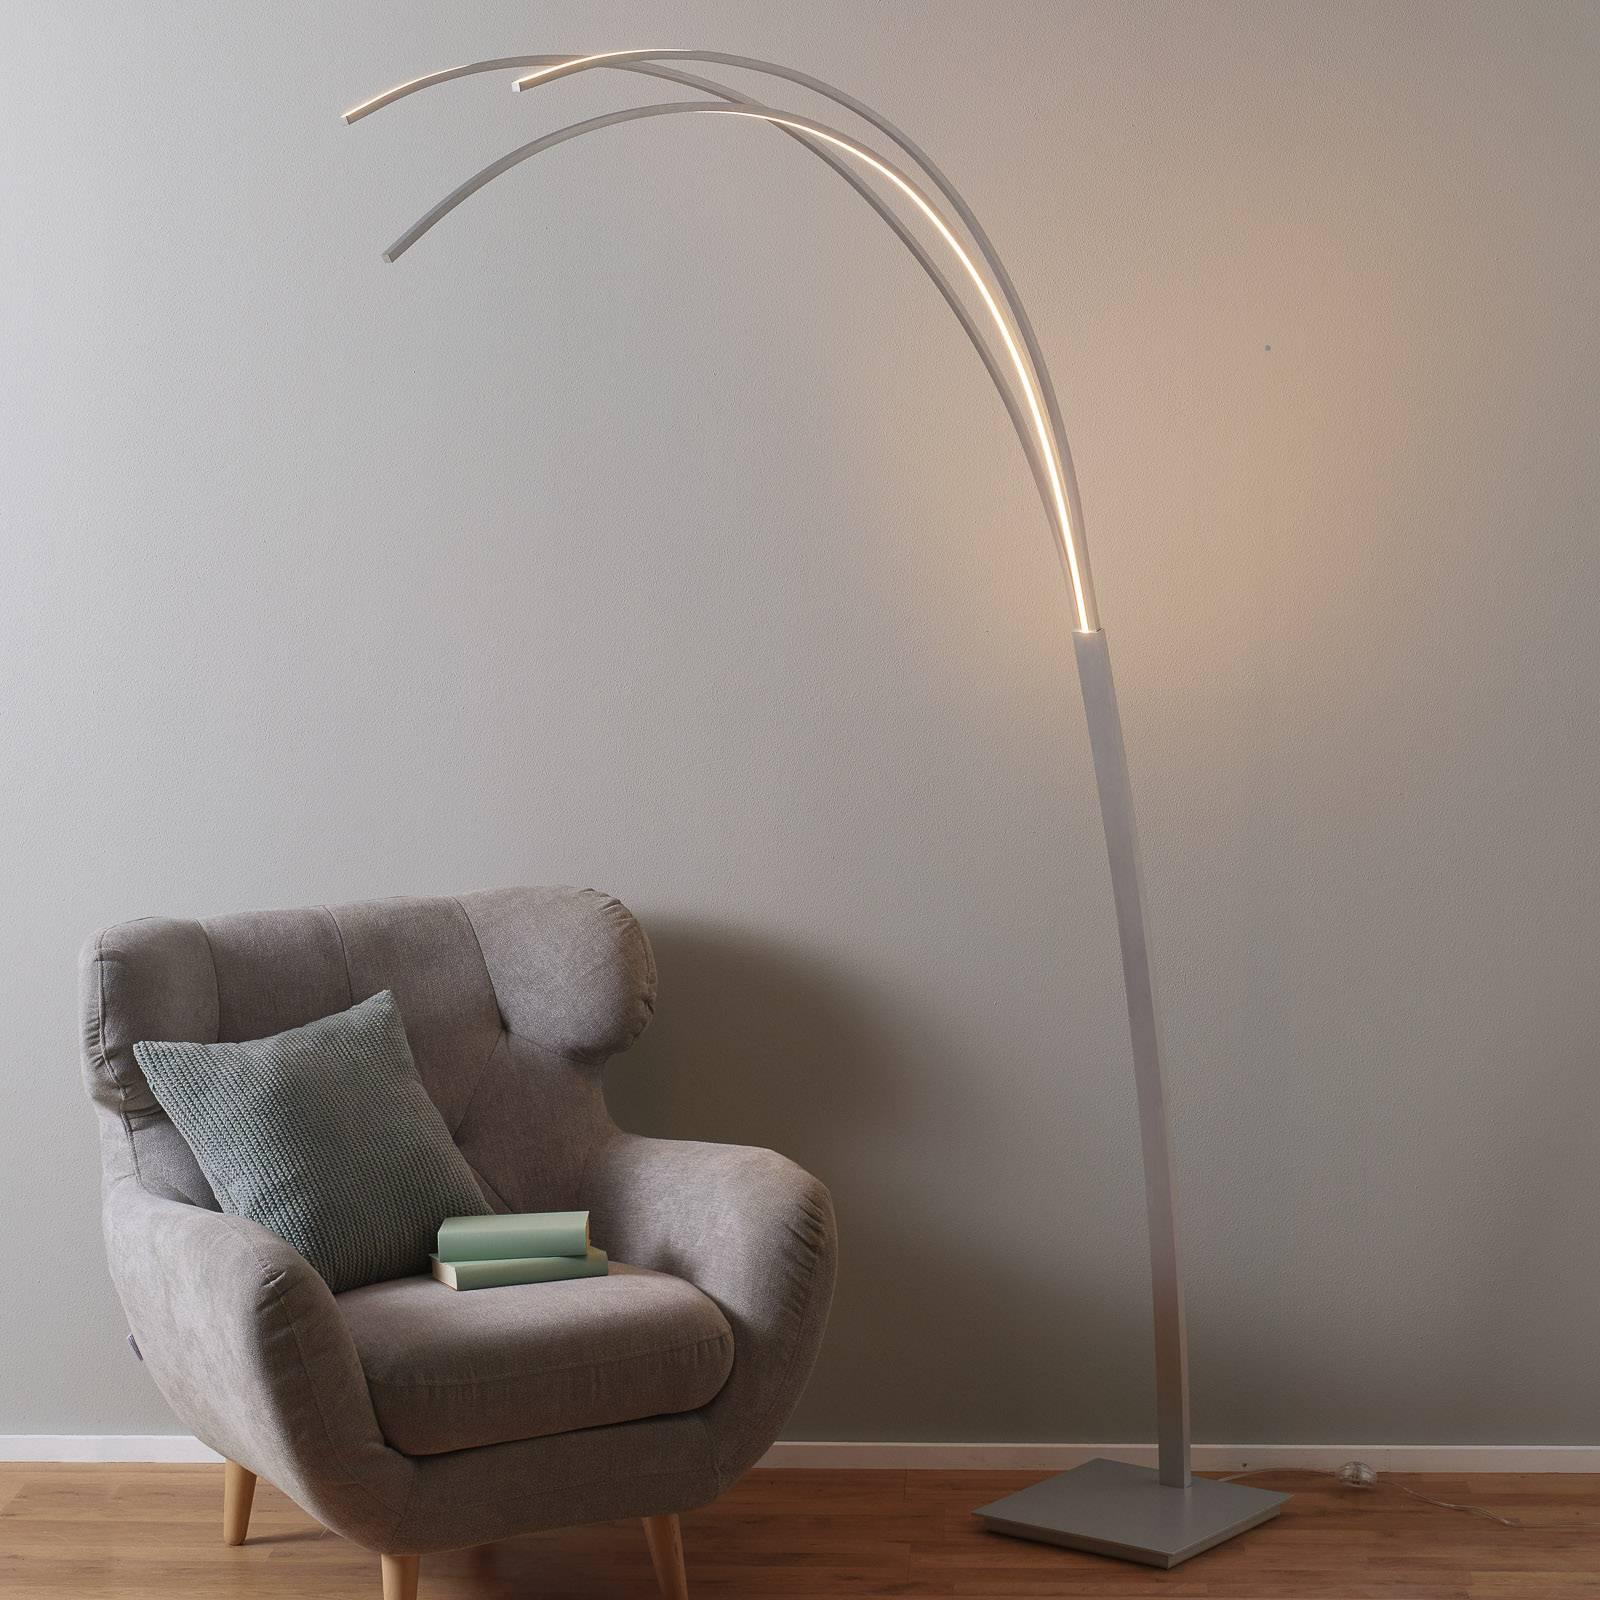 Bopp Bow - LED-Bogenleuchte, dimmbar günstig online kaufen